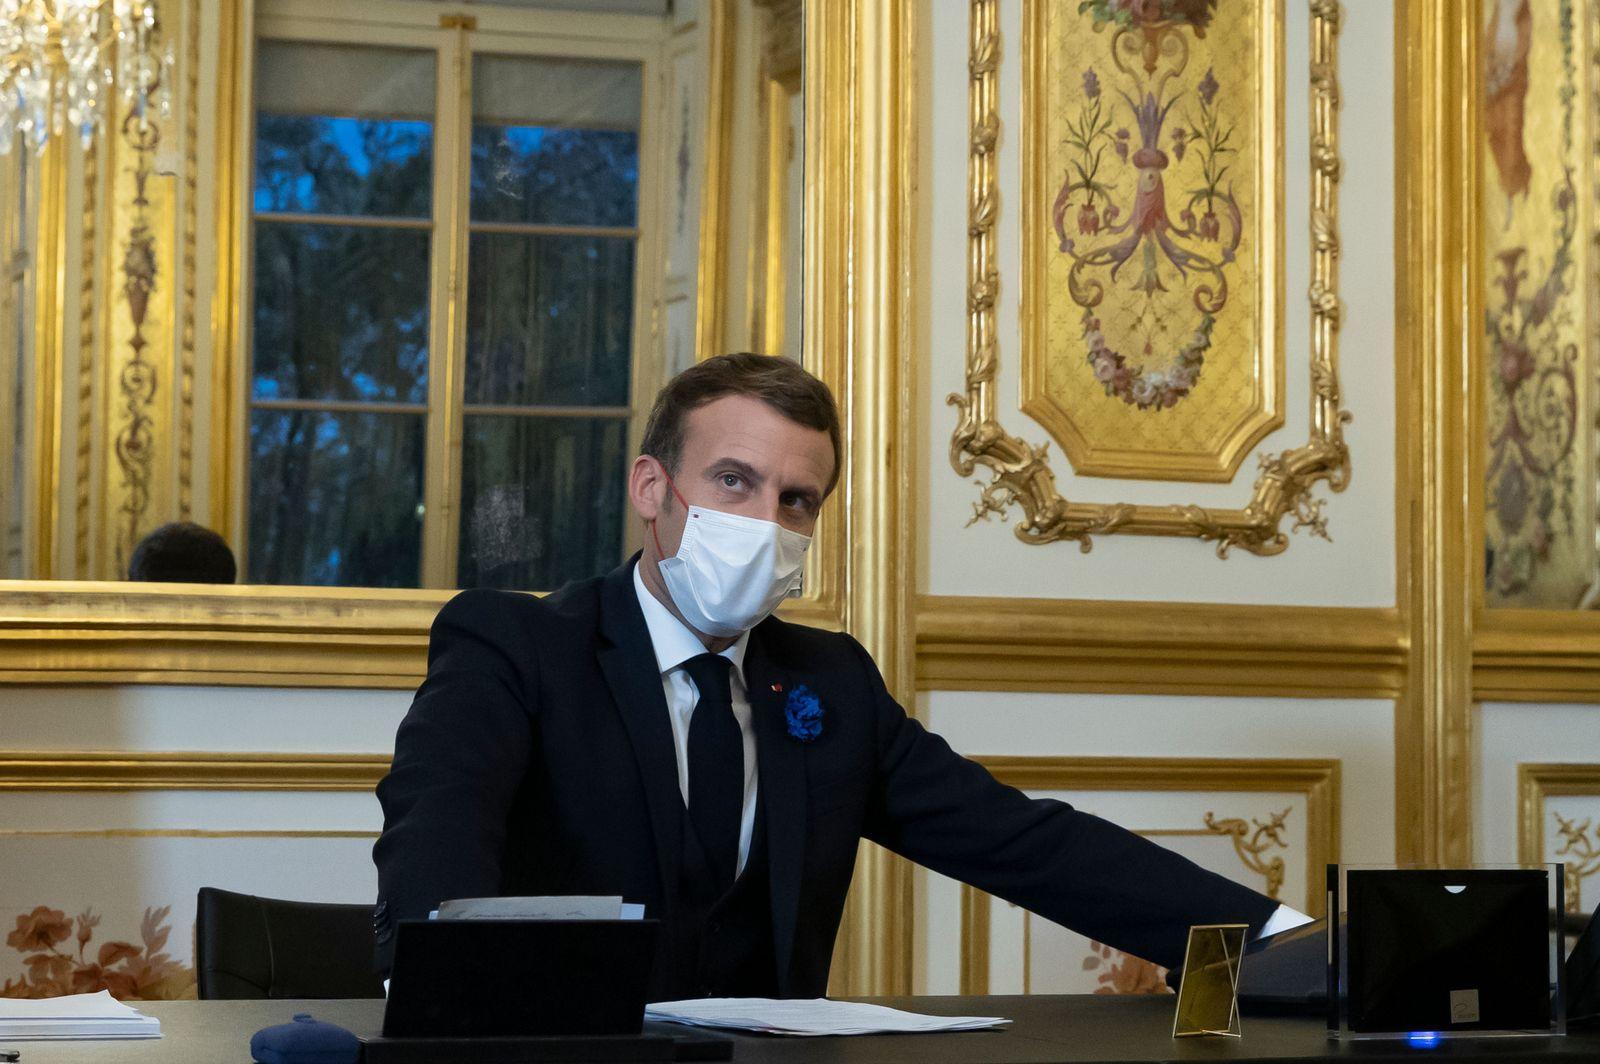 French President Macron congratulates US president elect Biden, Paris, France - 01 Jan 2000